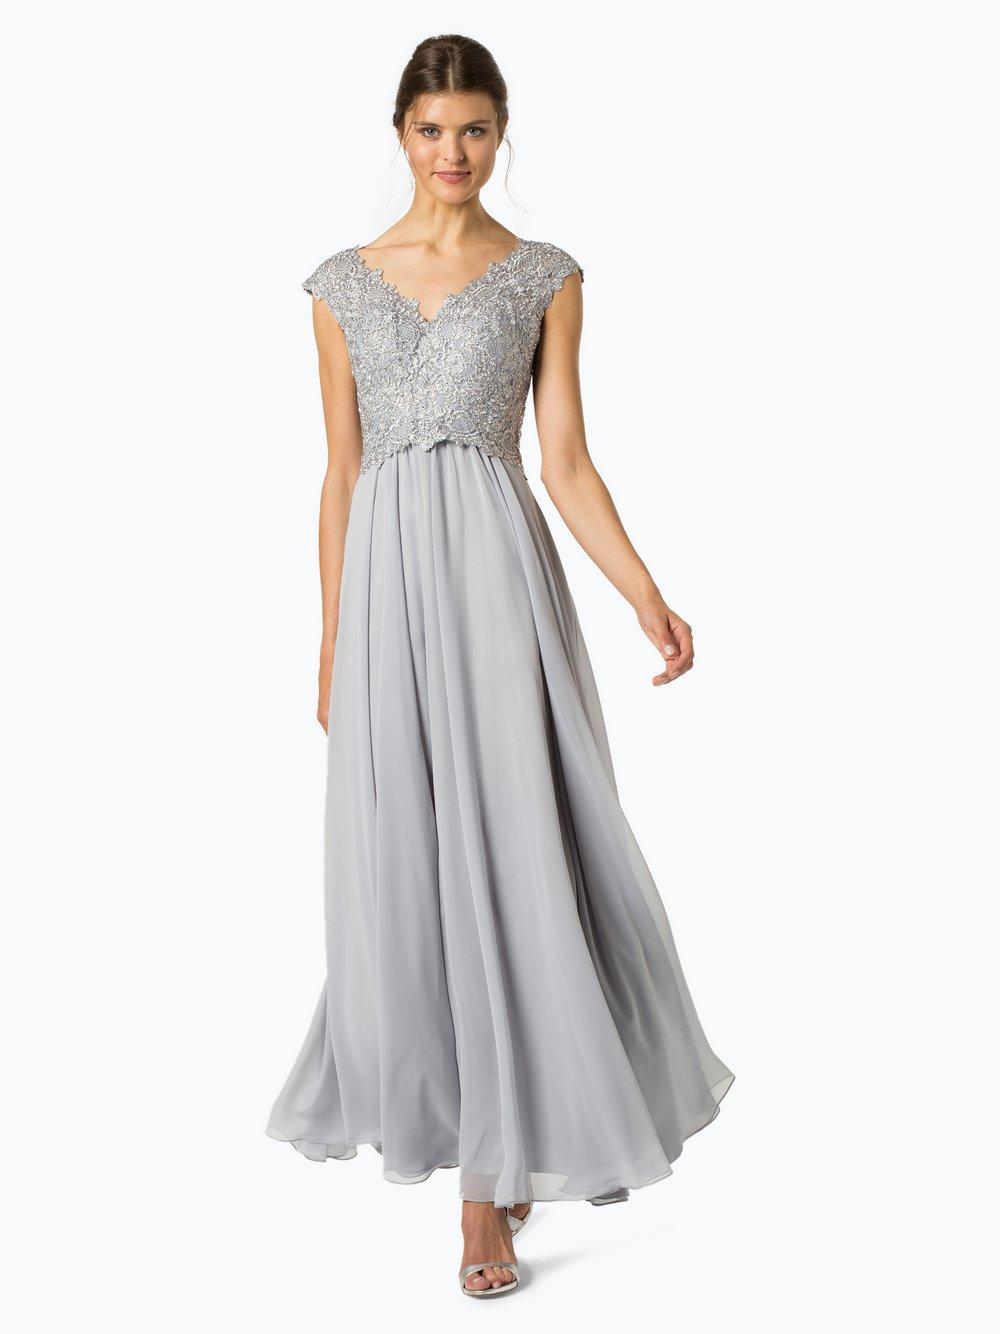 Luxuar Fashion – Damska sukienka wieczorowa, szary Van Graaf 419453-0001-00360